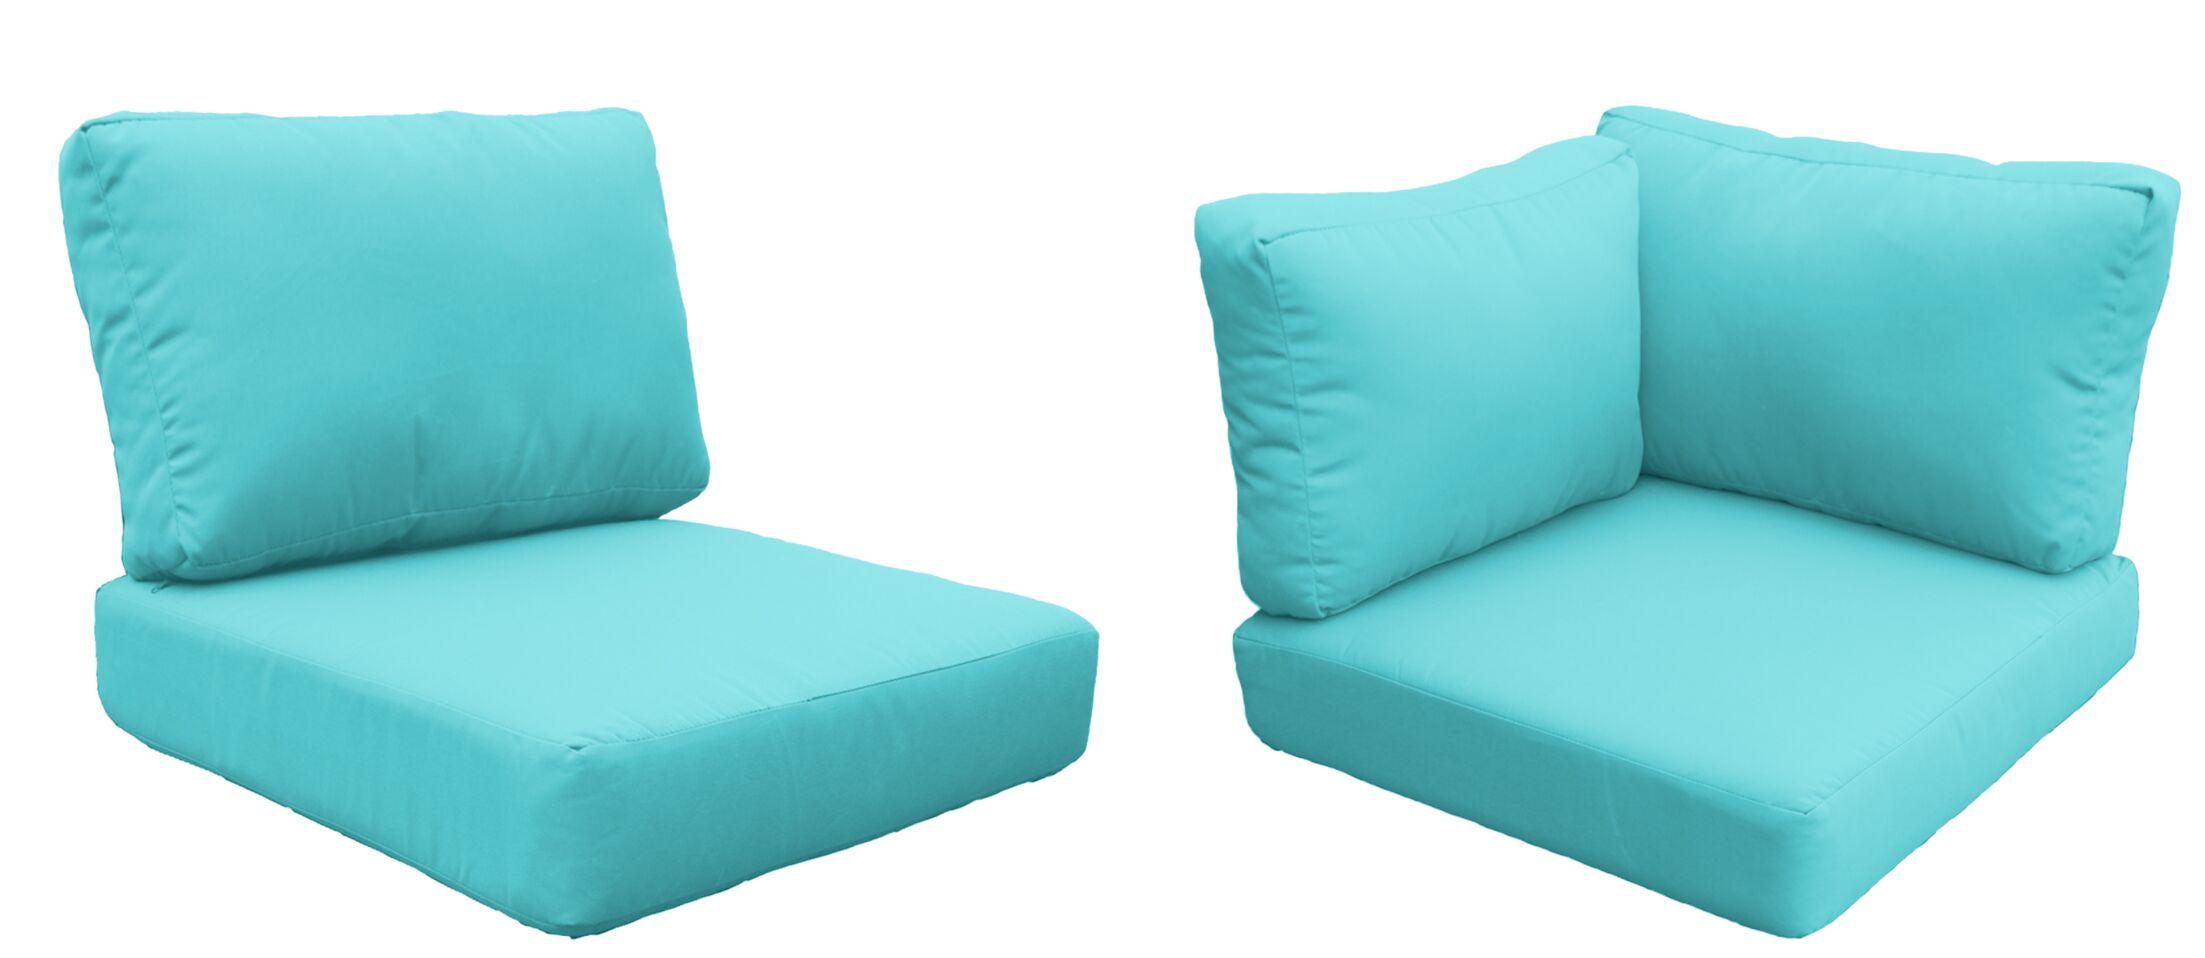 Barbados 14 Piece Outdoor Cushion Set Fabric: Aruba